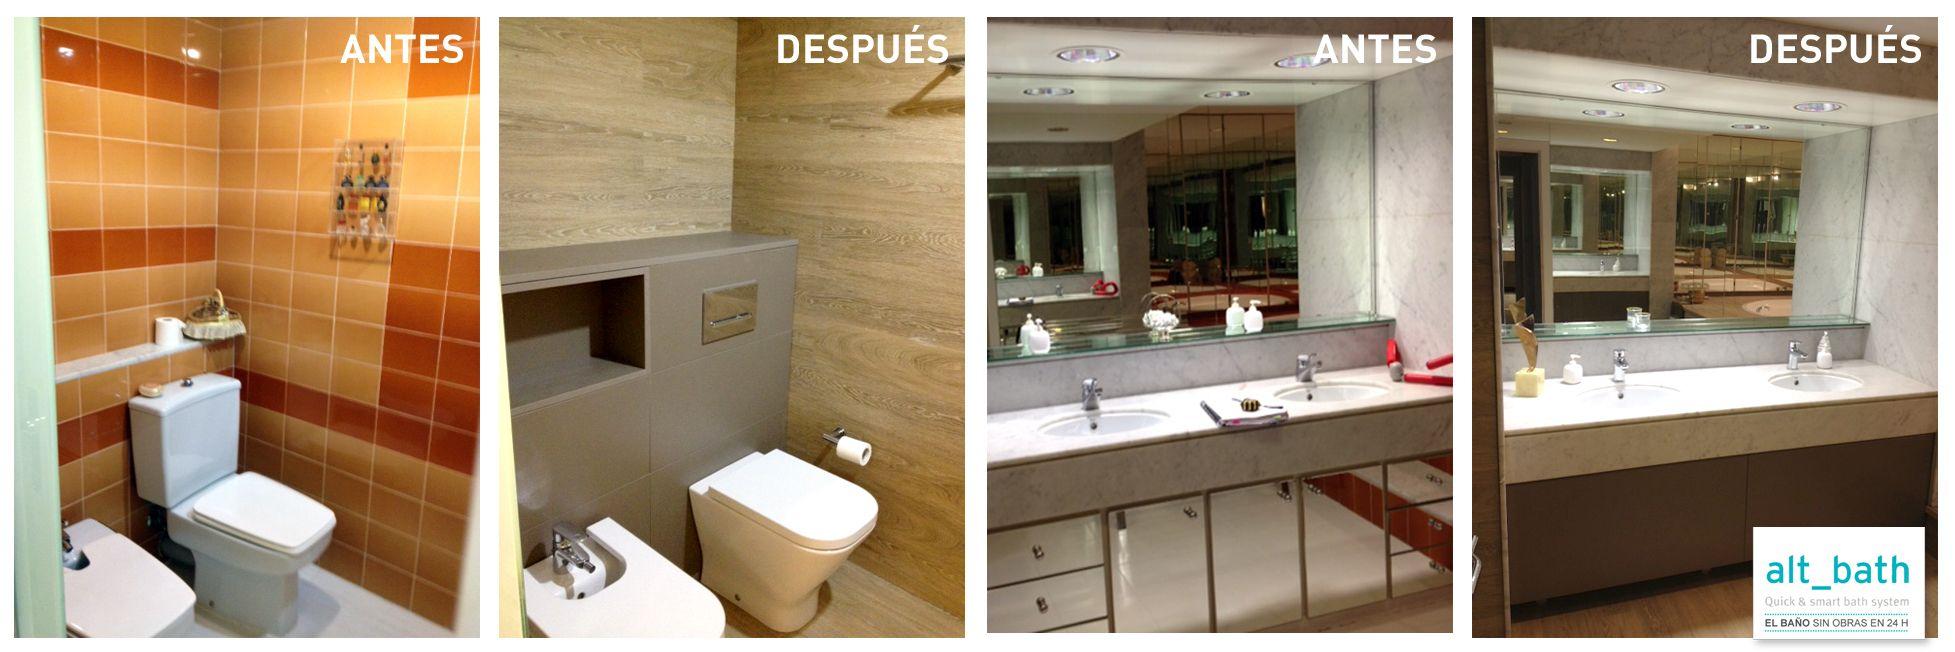 Alt_bath rehabilita un baño  de grandes dimensiones en Pedralbes